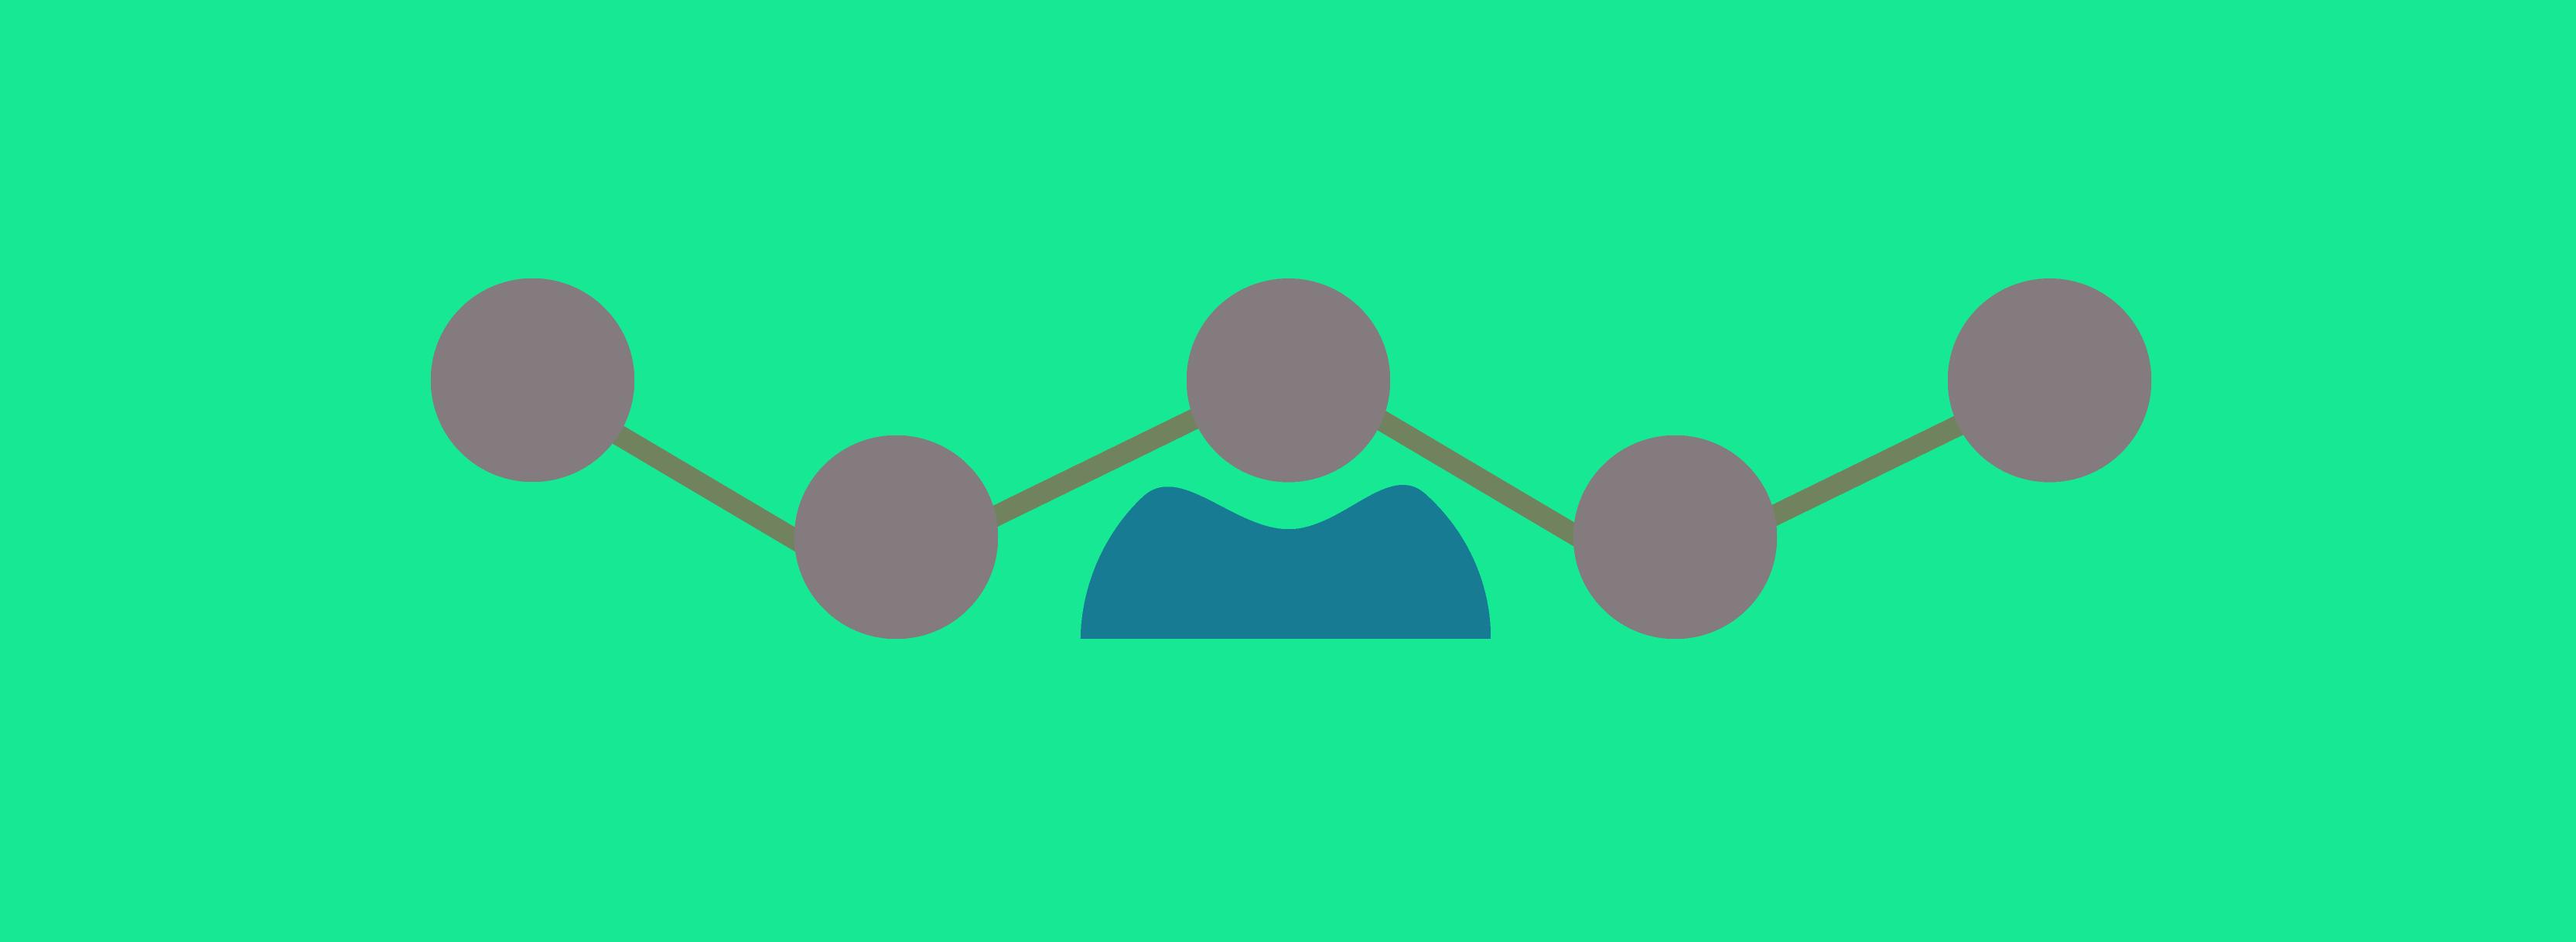 Characterizing CNAME cloaking-based tracking